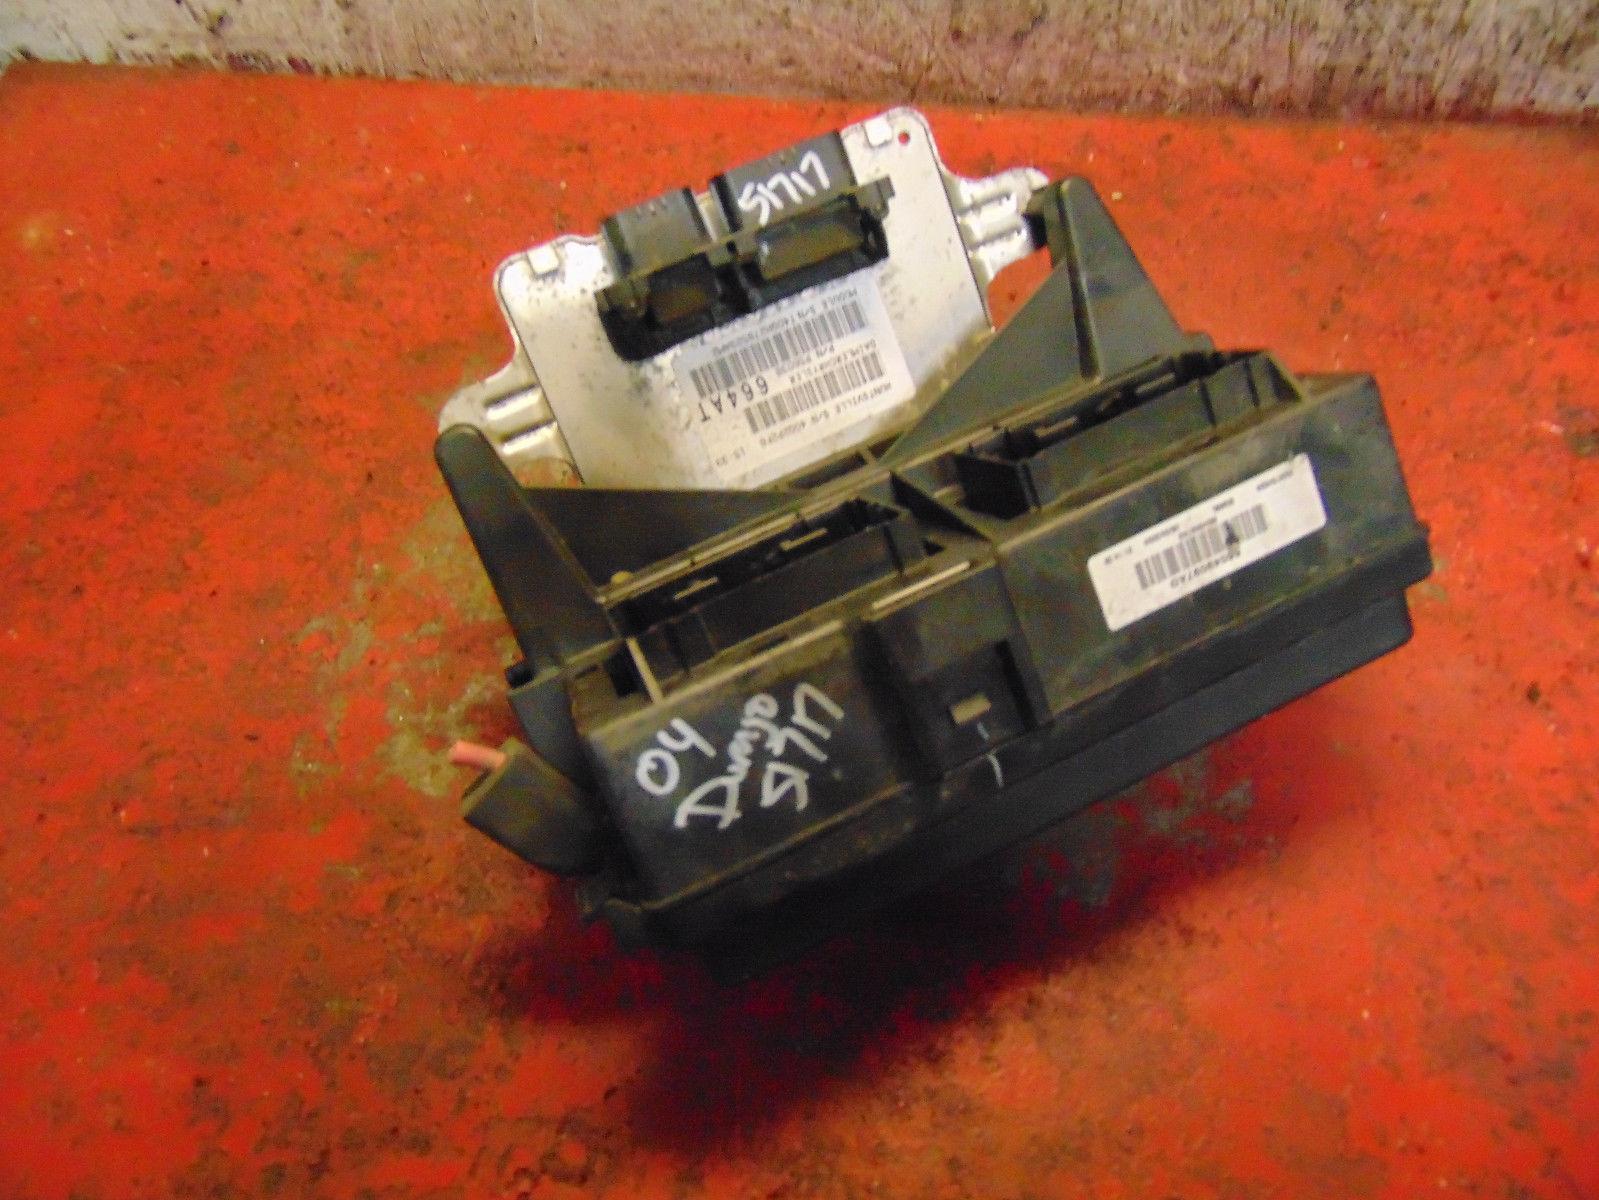 04 Durango Engine Compartment Fuse Box Diy Enthusiasts Wiring 05 Dodge And Similar Items Rh Bonanza Com Noise 99